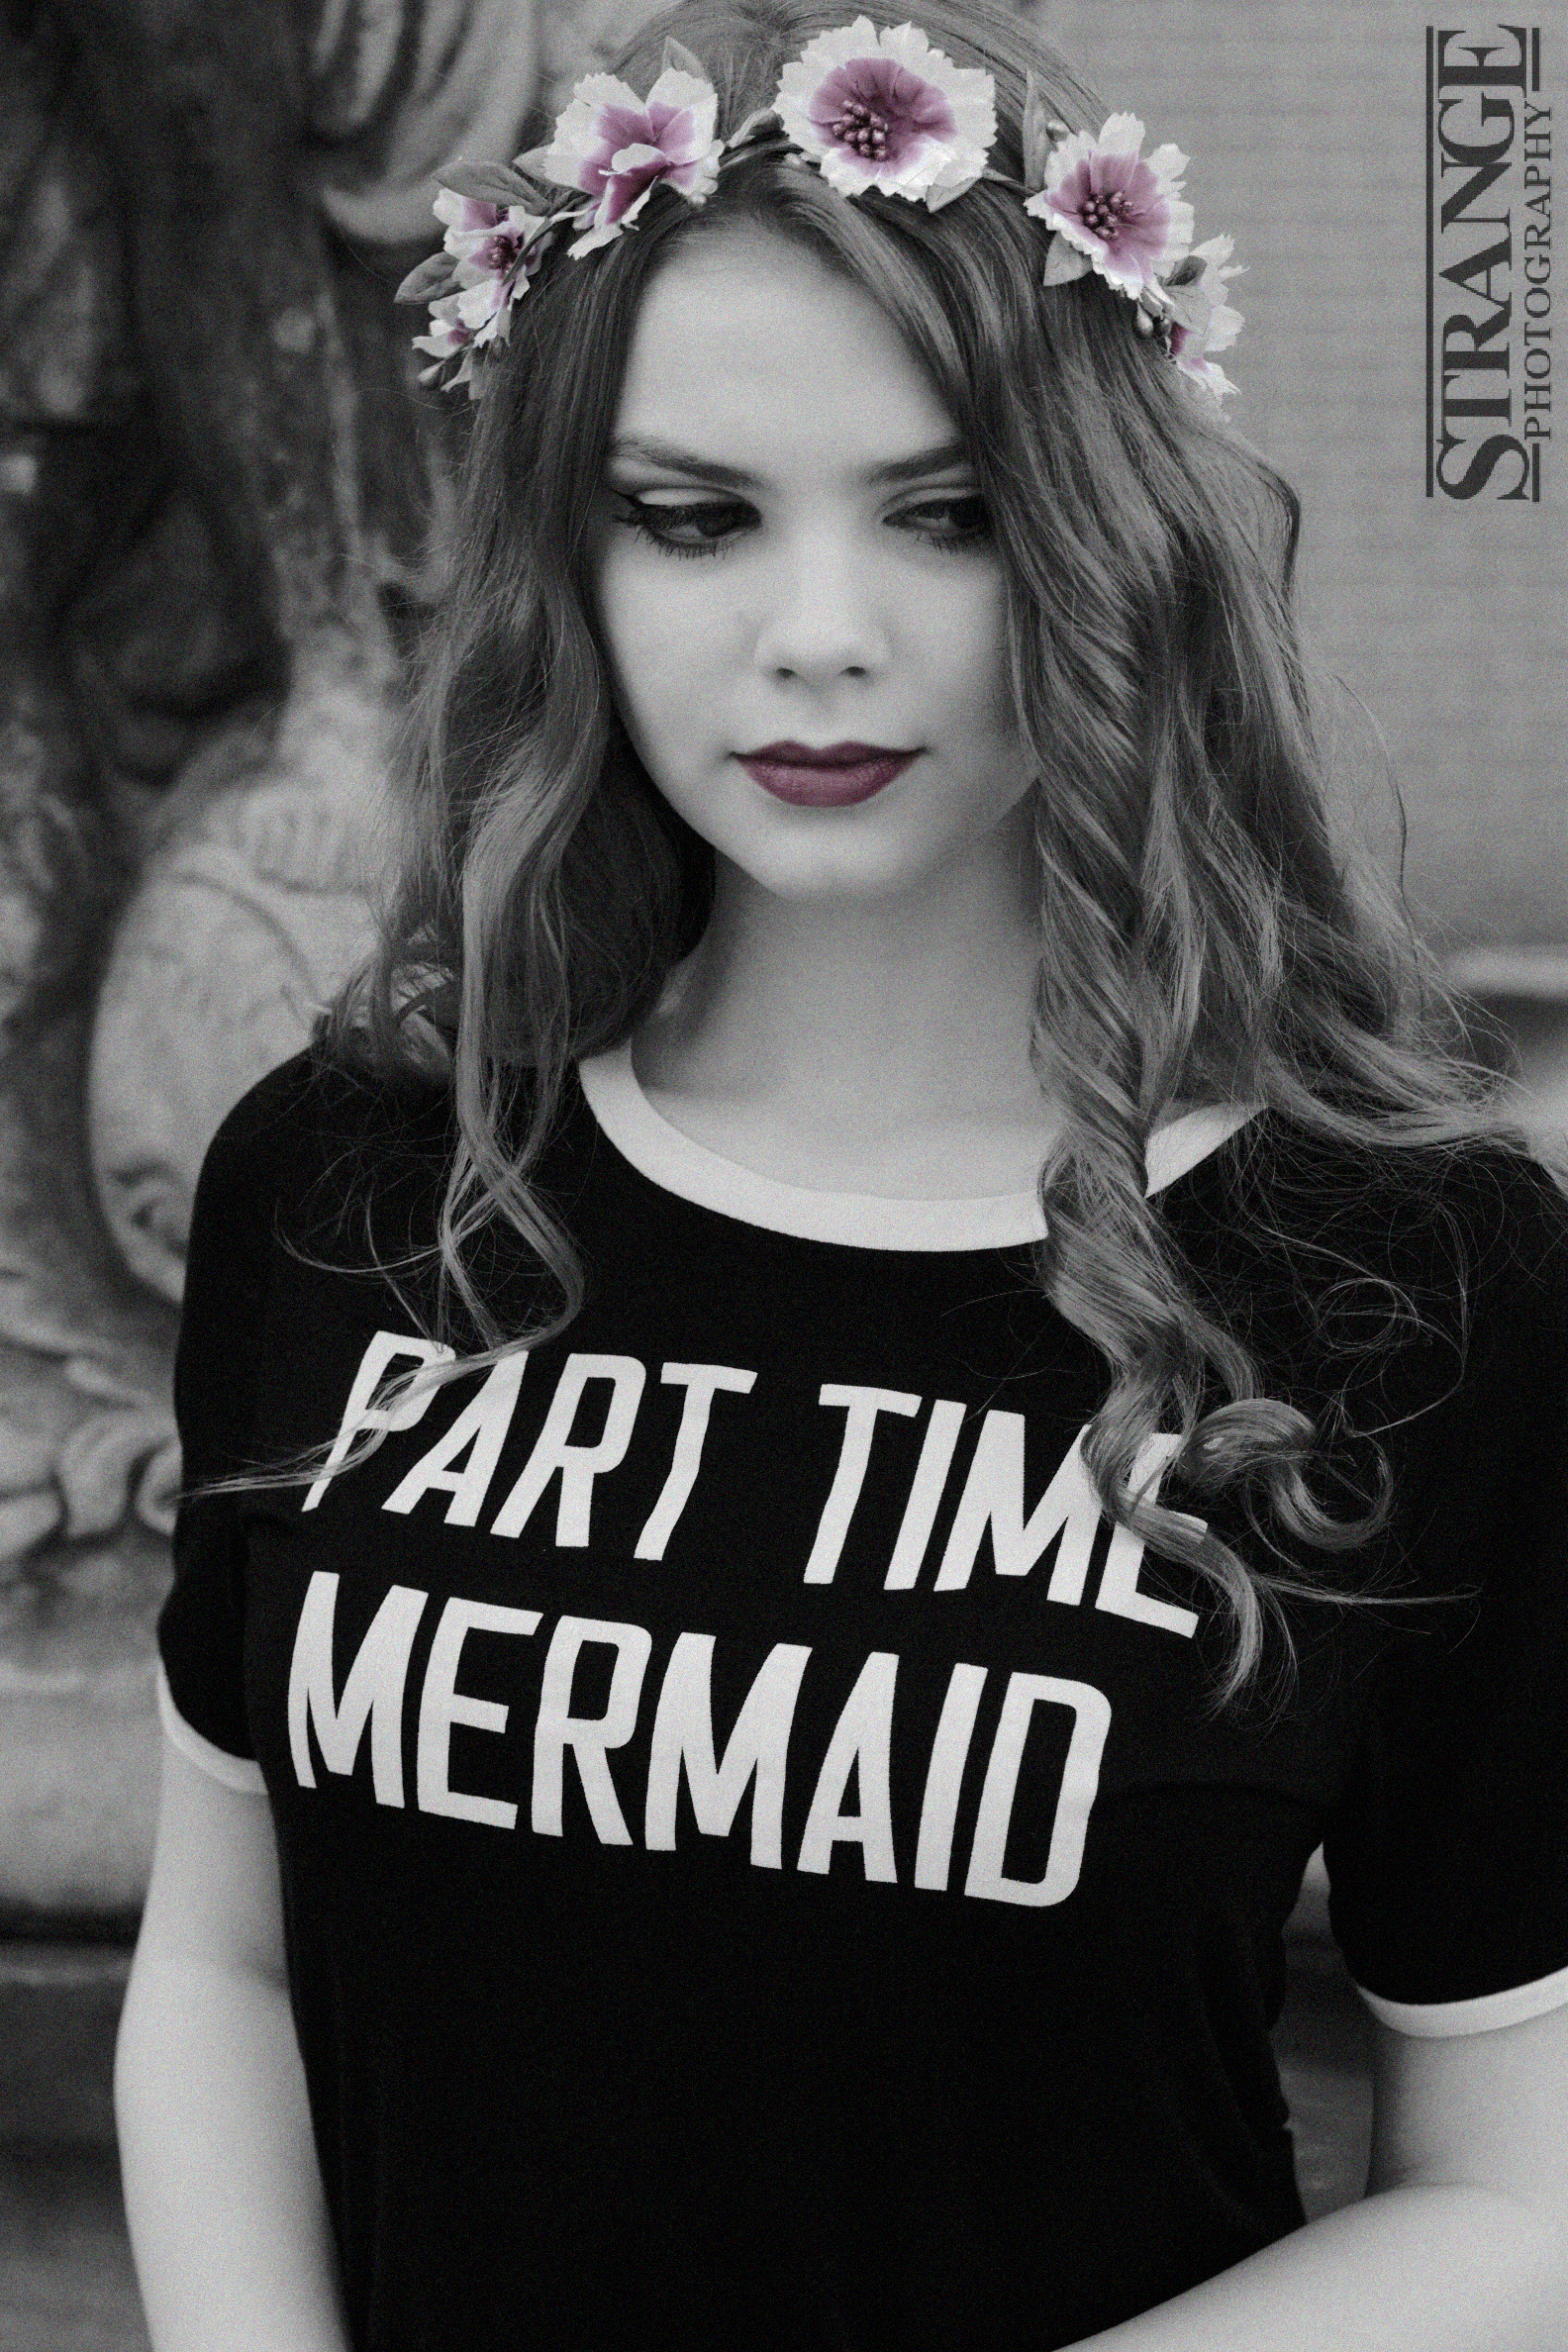 Mermaid 1-2